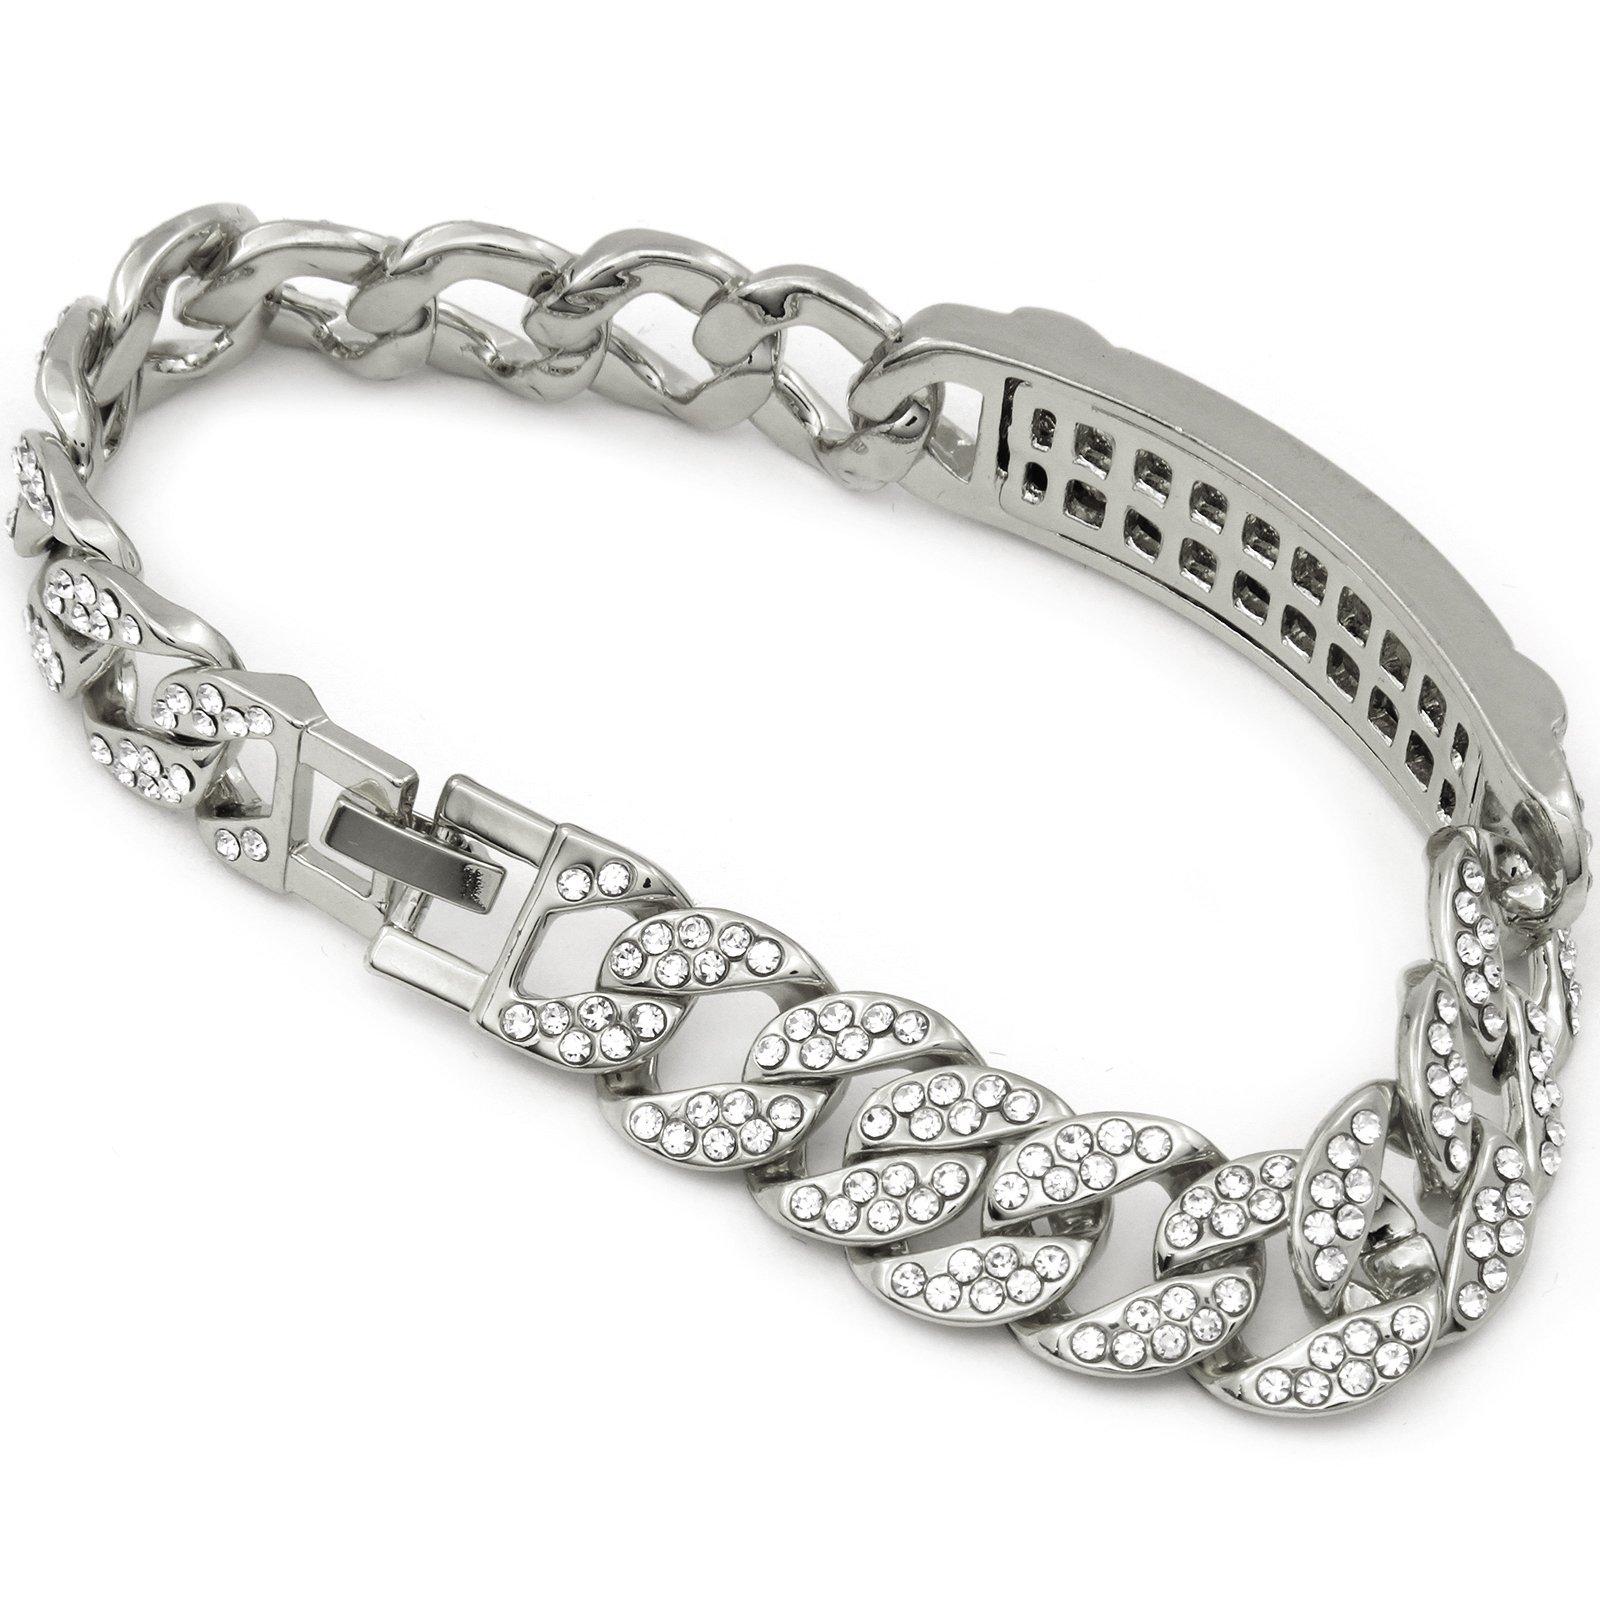 Men's Hip Hop Silver Tone Iced Out Cz 15mm 9'' Bracelet Miami Cuban Style Chain Link (s)